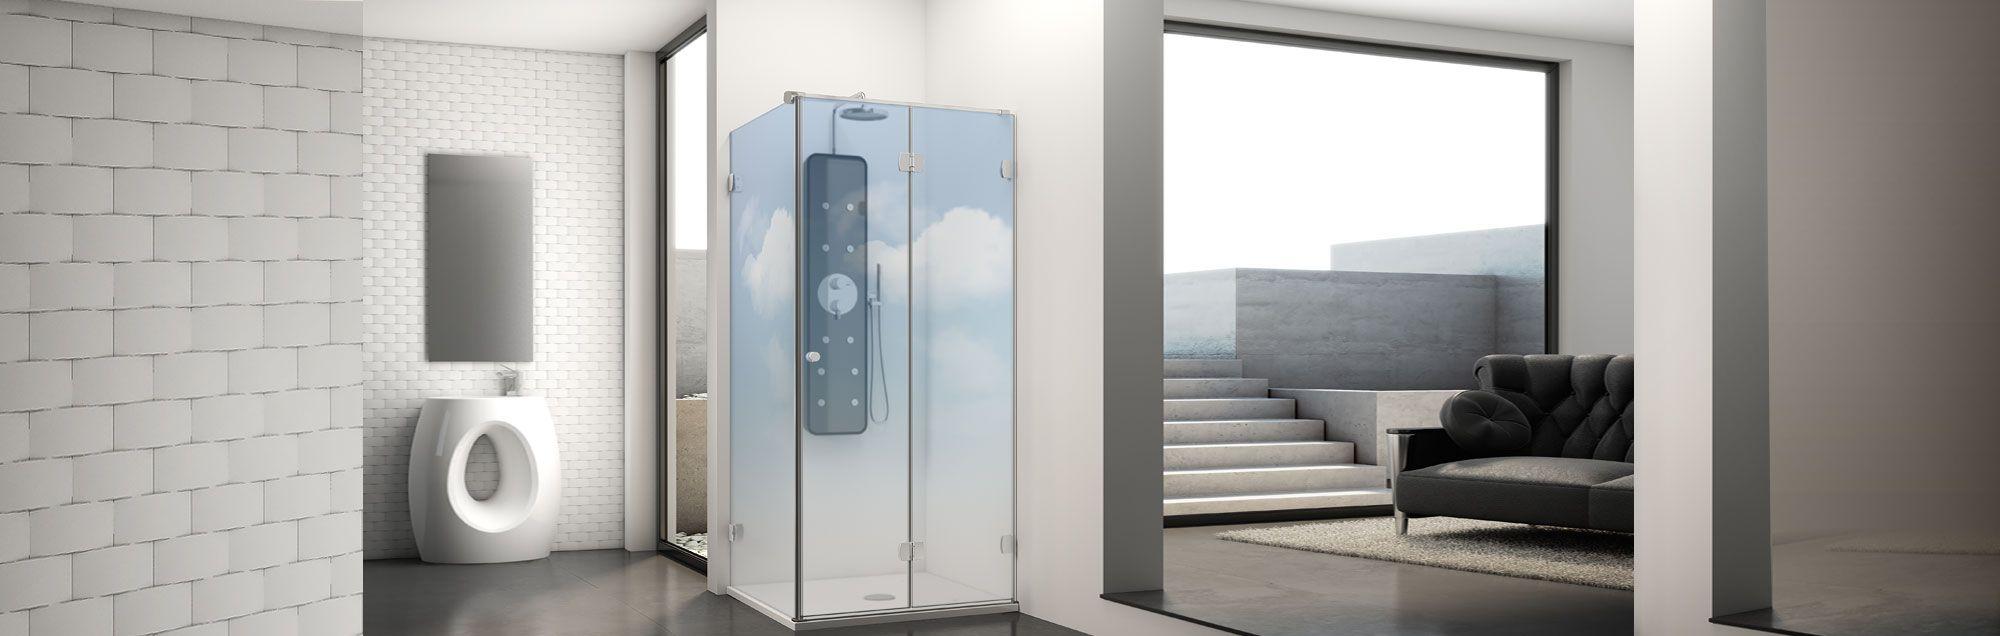 Newglass Collection swinging bathroom enclosures